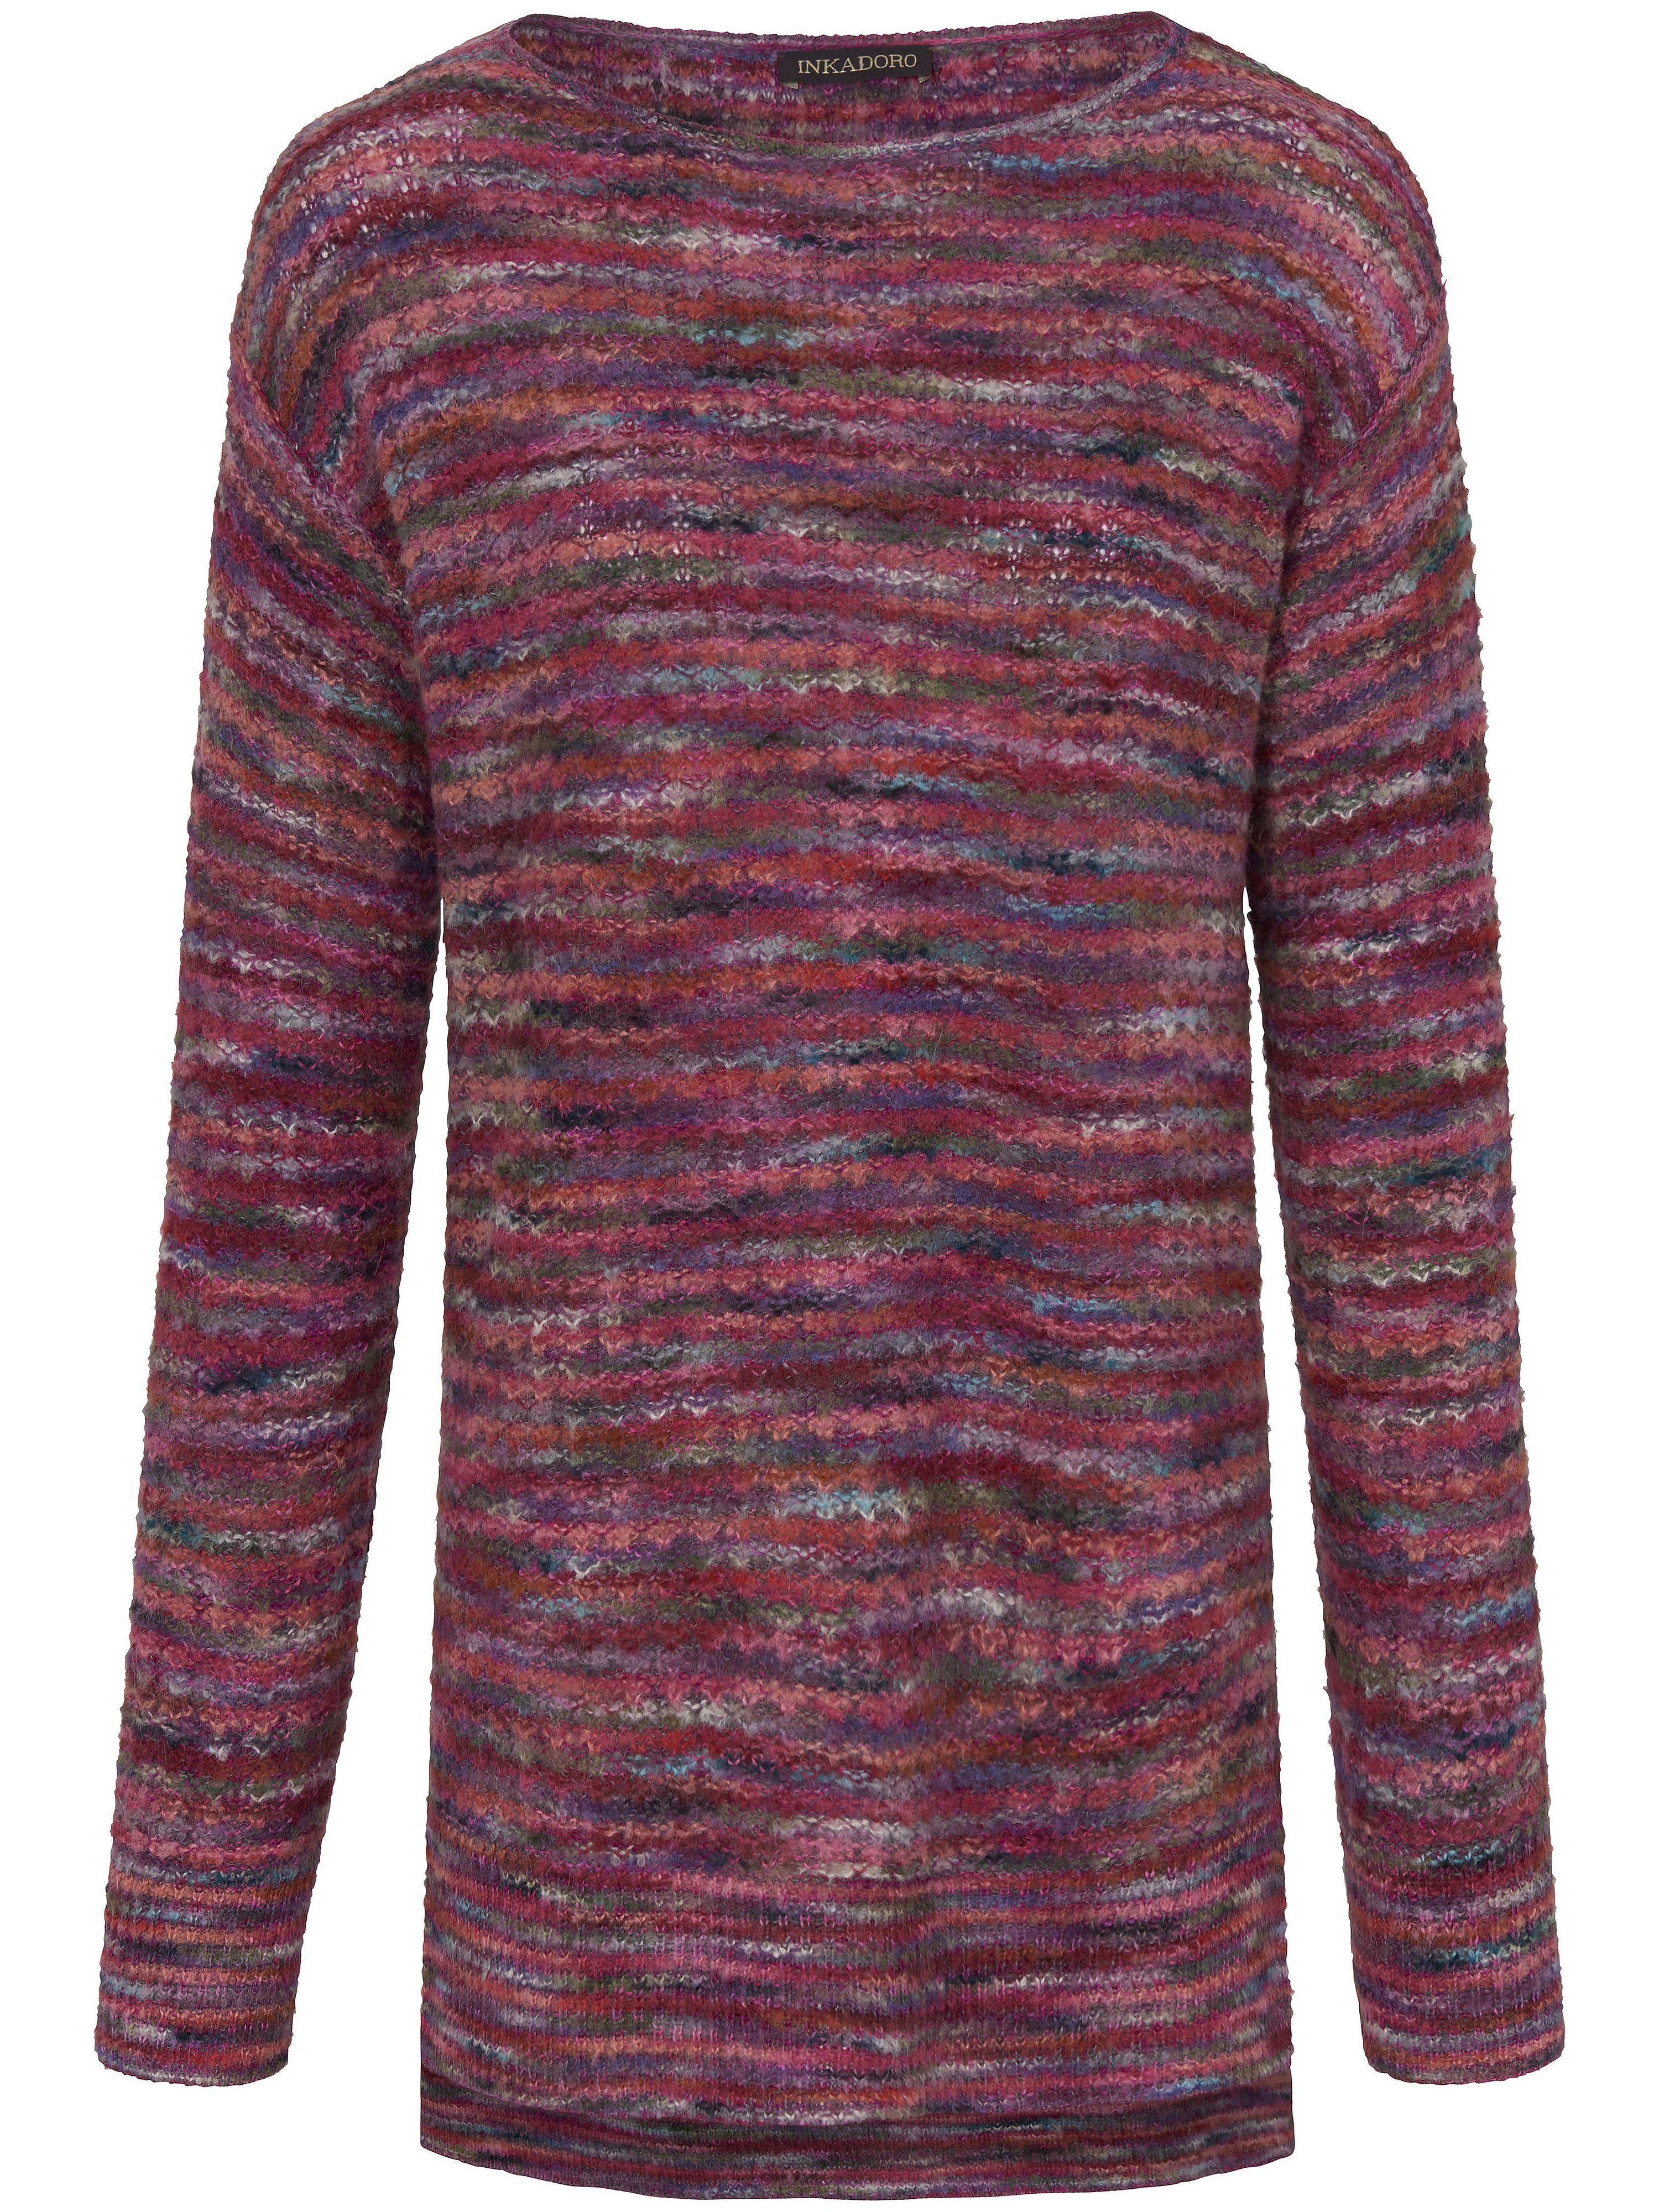 Le pull long  Inkadoro multicolore taille 42